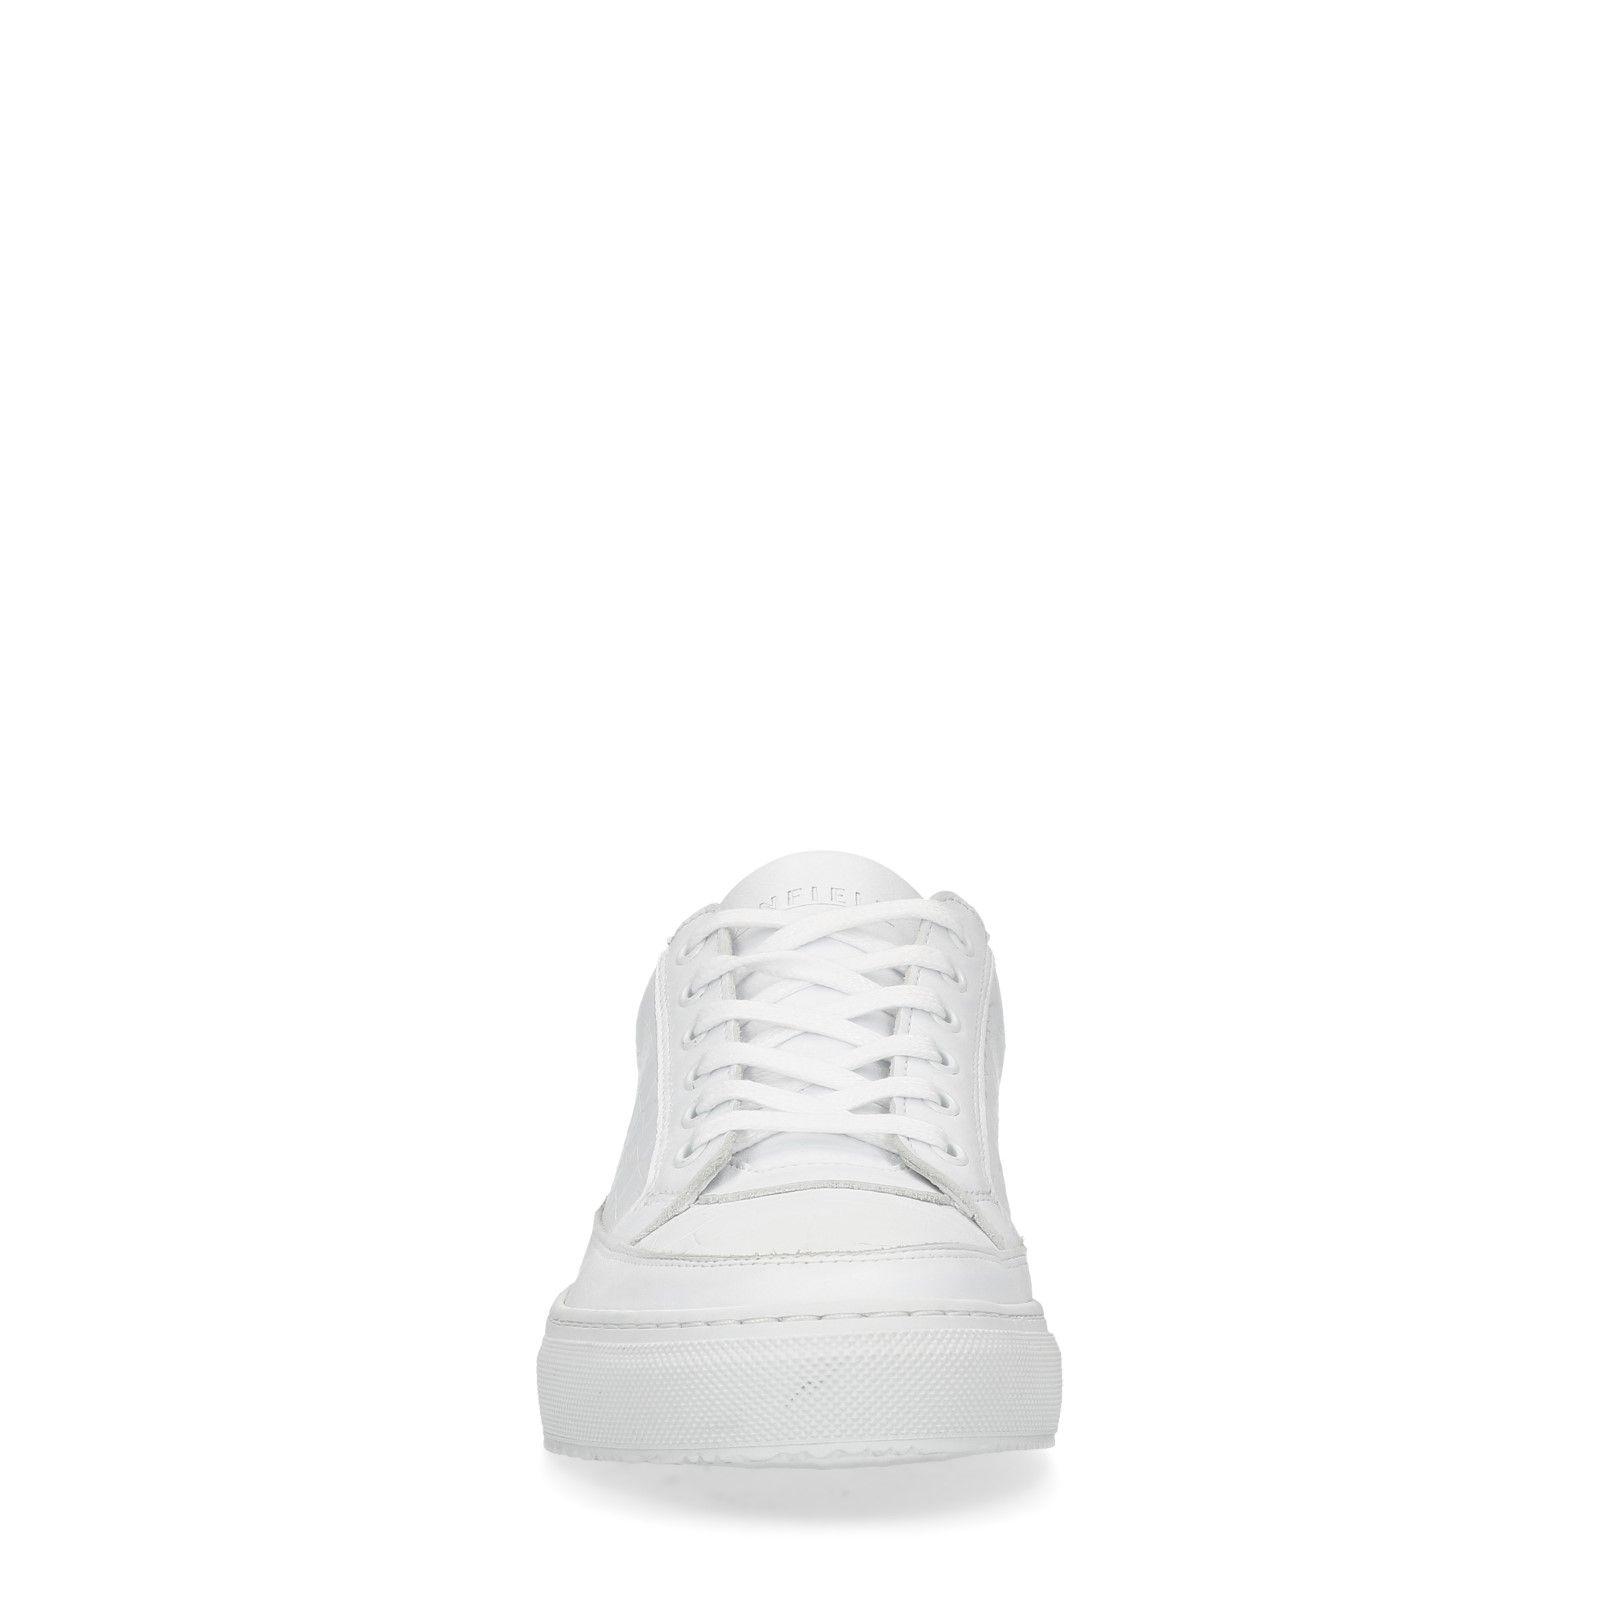 287db8fac8d201 Manfield Weiße Leder-Sneaker. prev